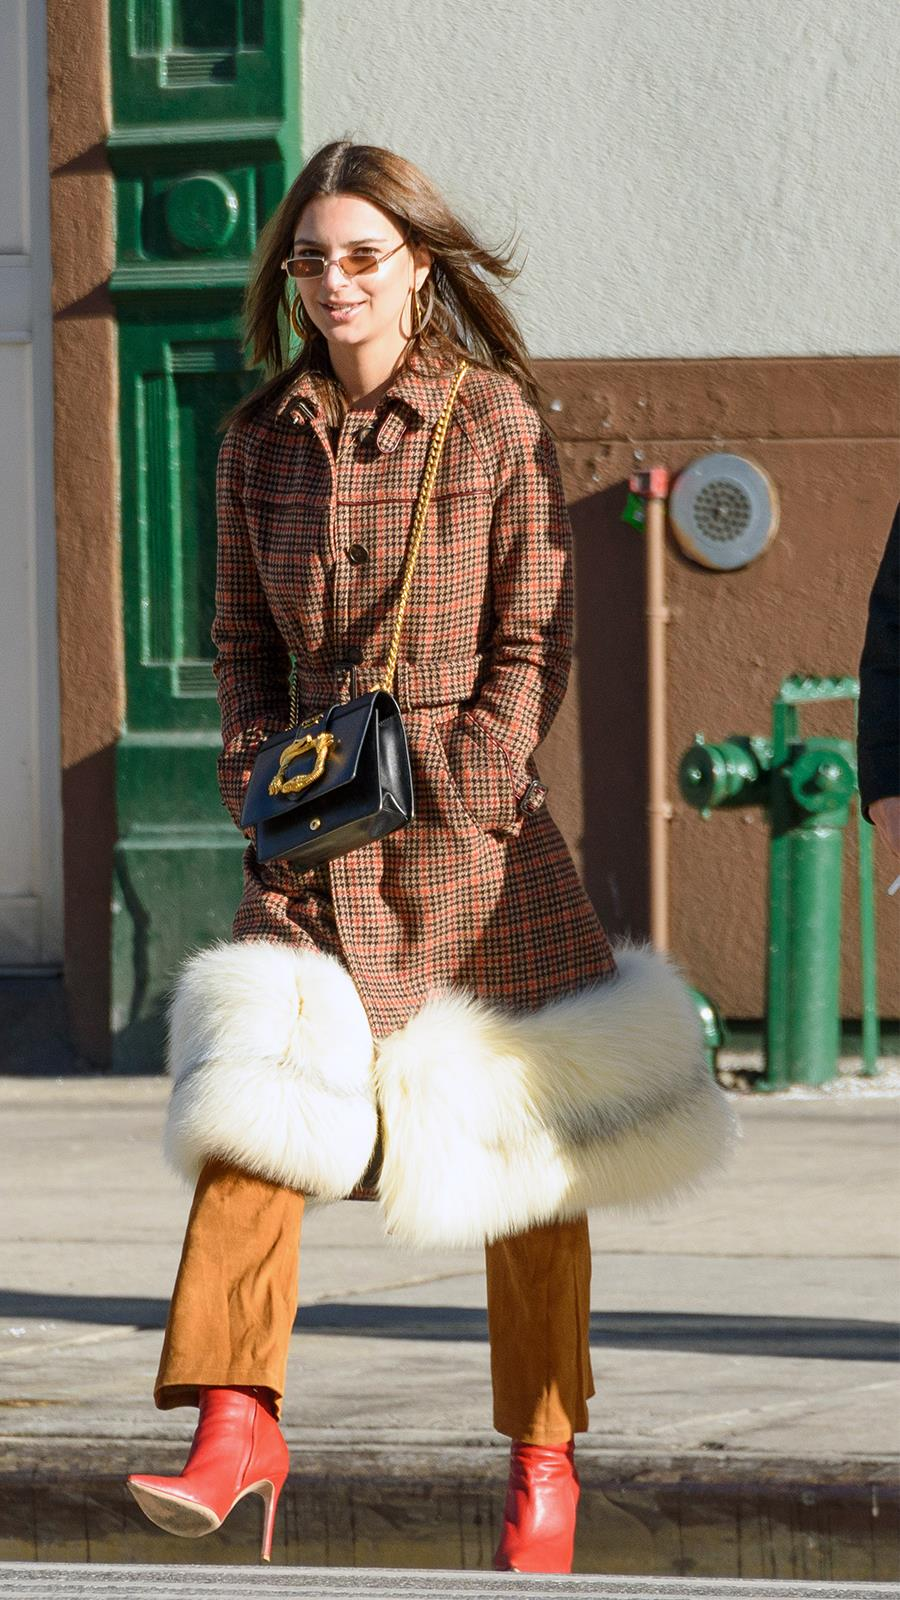 Invierno De Están Que Mujer Abrigos 10 Moda Este Cuadros Instyle Uxfcqg